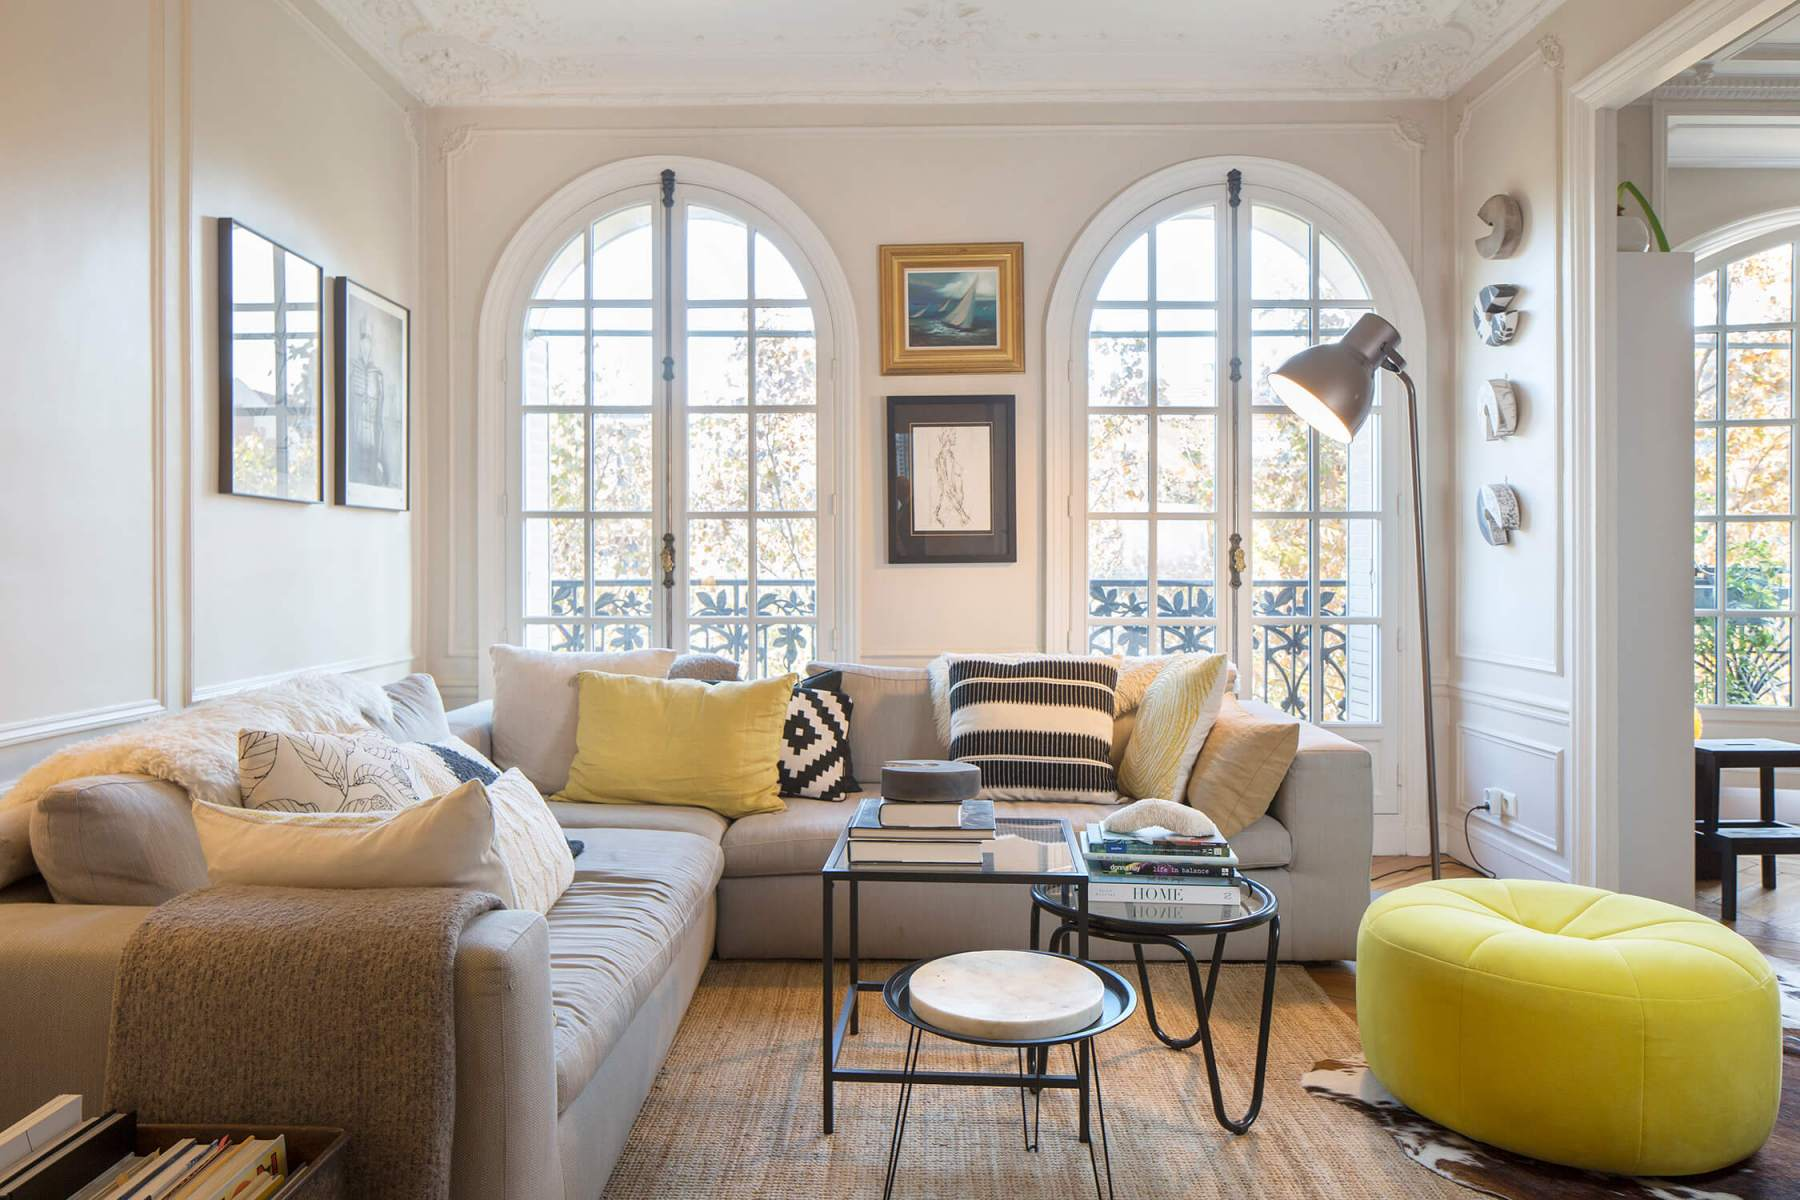 Interior-living-room-corner-sofa